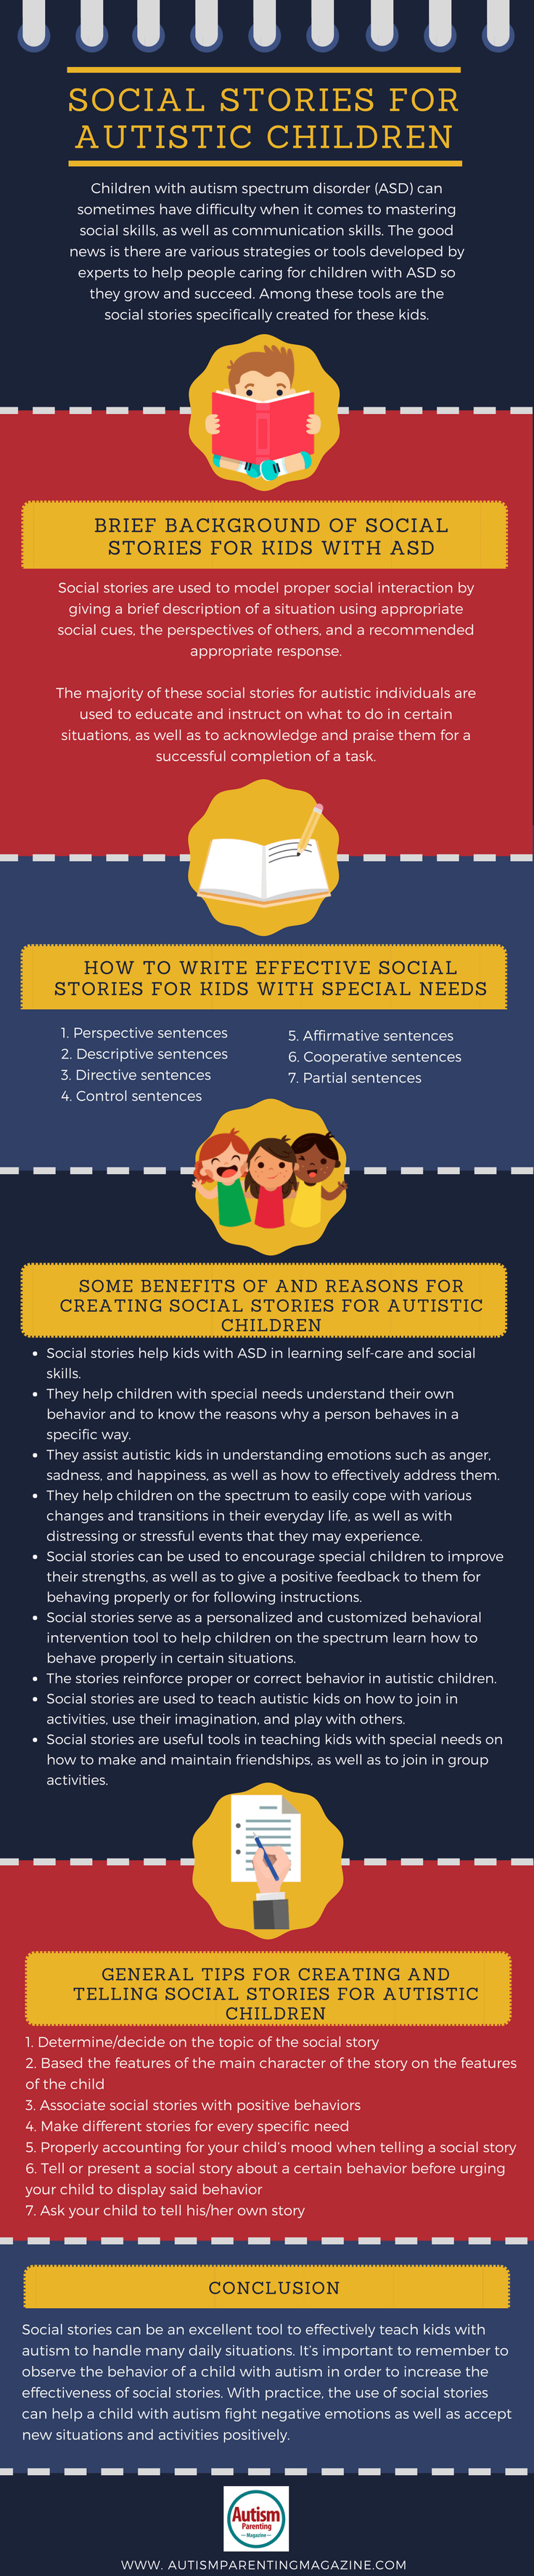 Social Stories For Autistic Children - Autism Parenting Magazine - Free Printable Social Stories For Kids